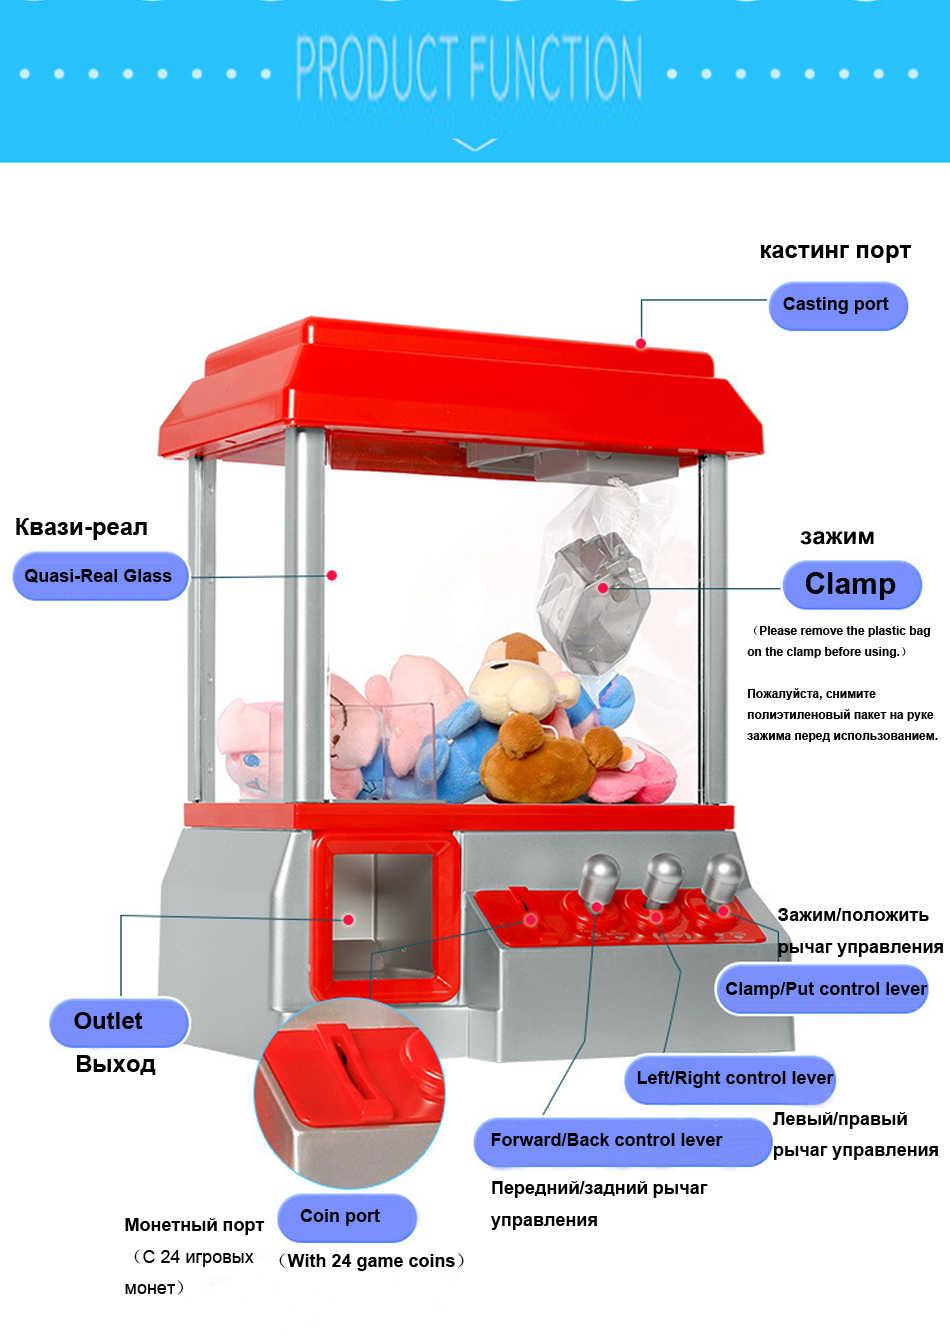 Klip Boneka Cakar Mesin Penangkap Crane Mesin Mesin Penjual Otomatis Permen Boneka Lucu Permainan Arcade Permainan UFO Penangkap Boneka Mainan Grabber